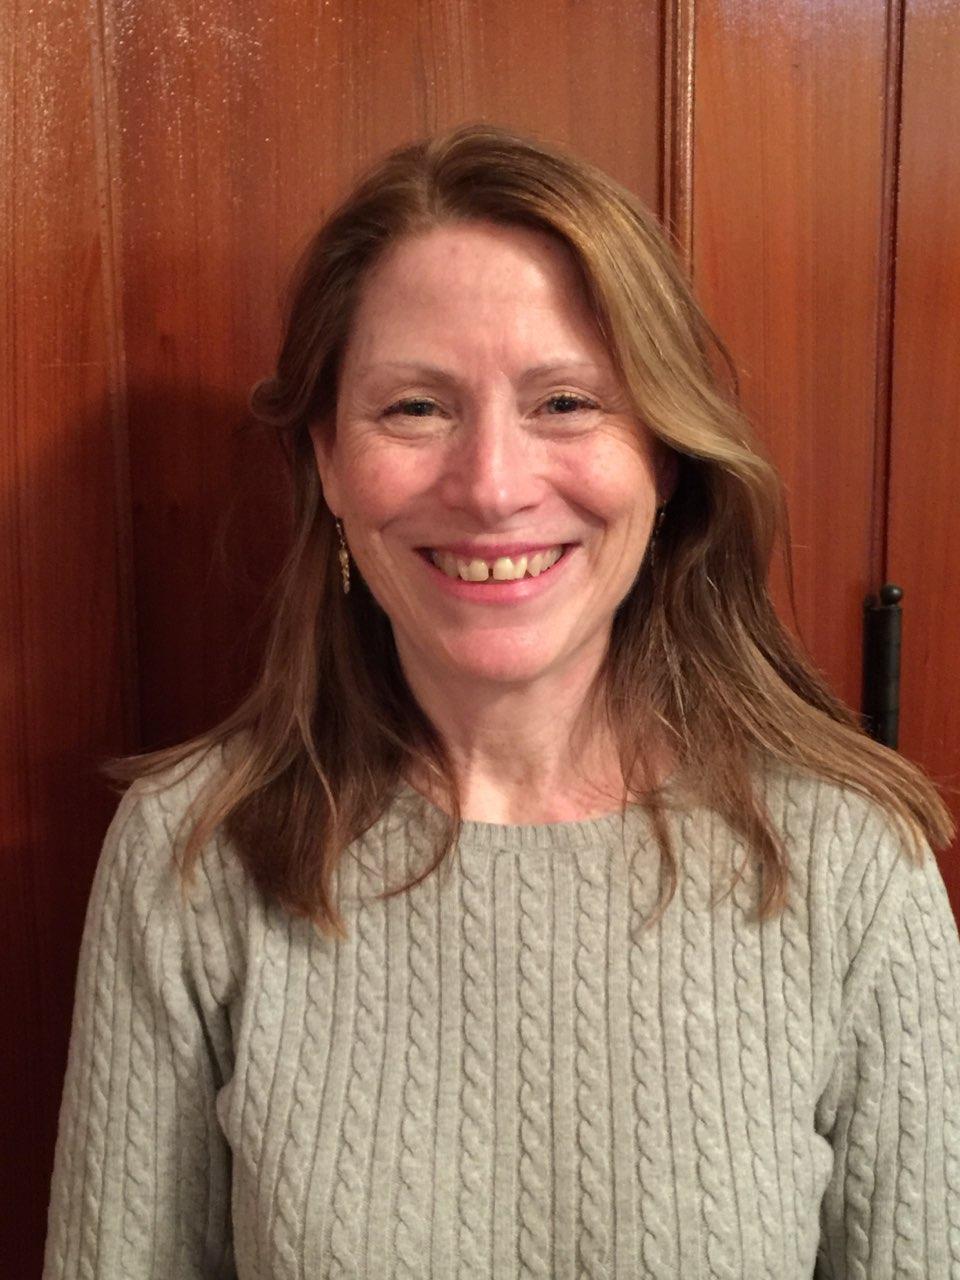 Kathy Fortini